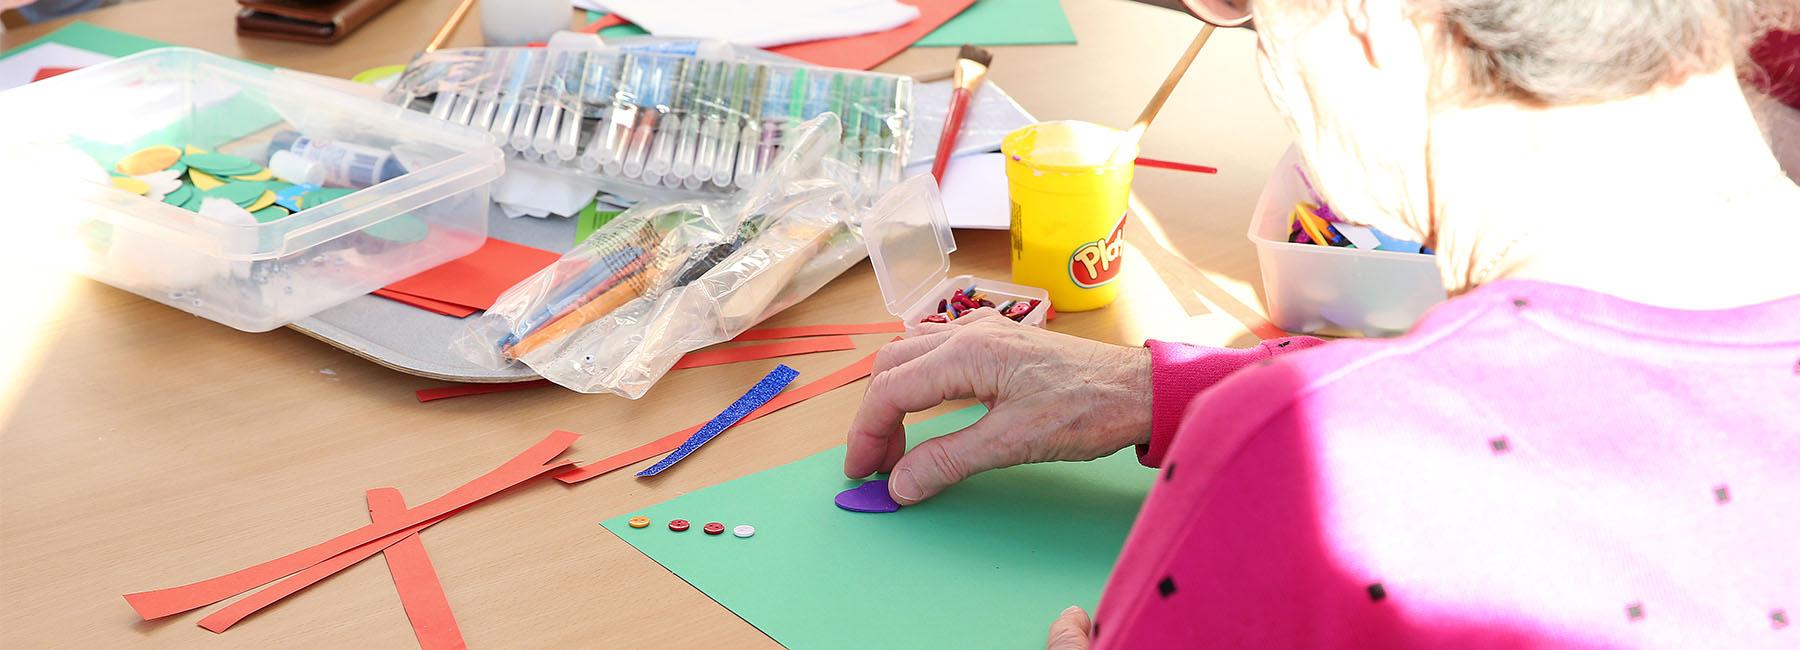 Activities Essex Nursing Home